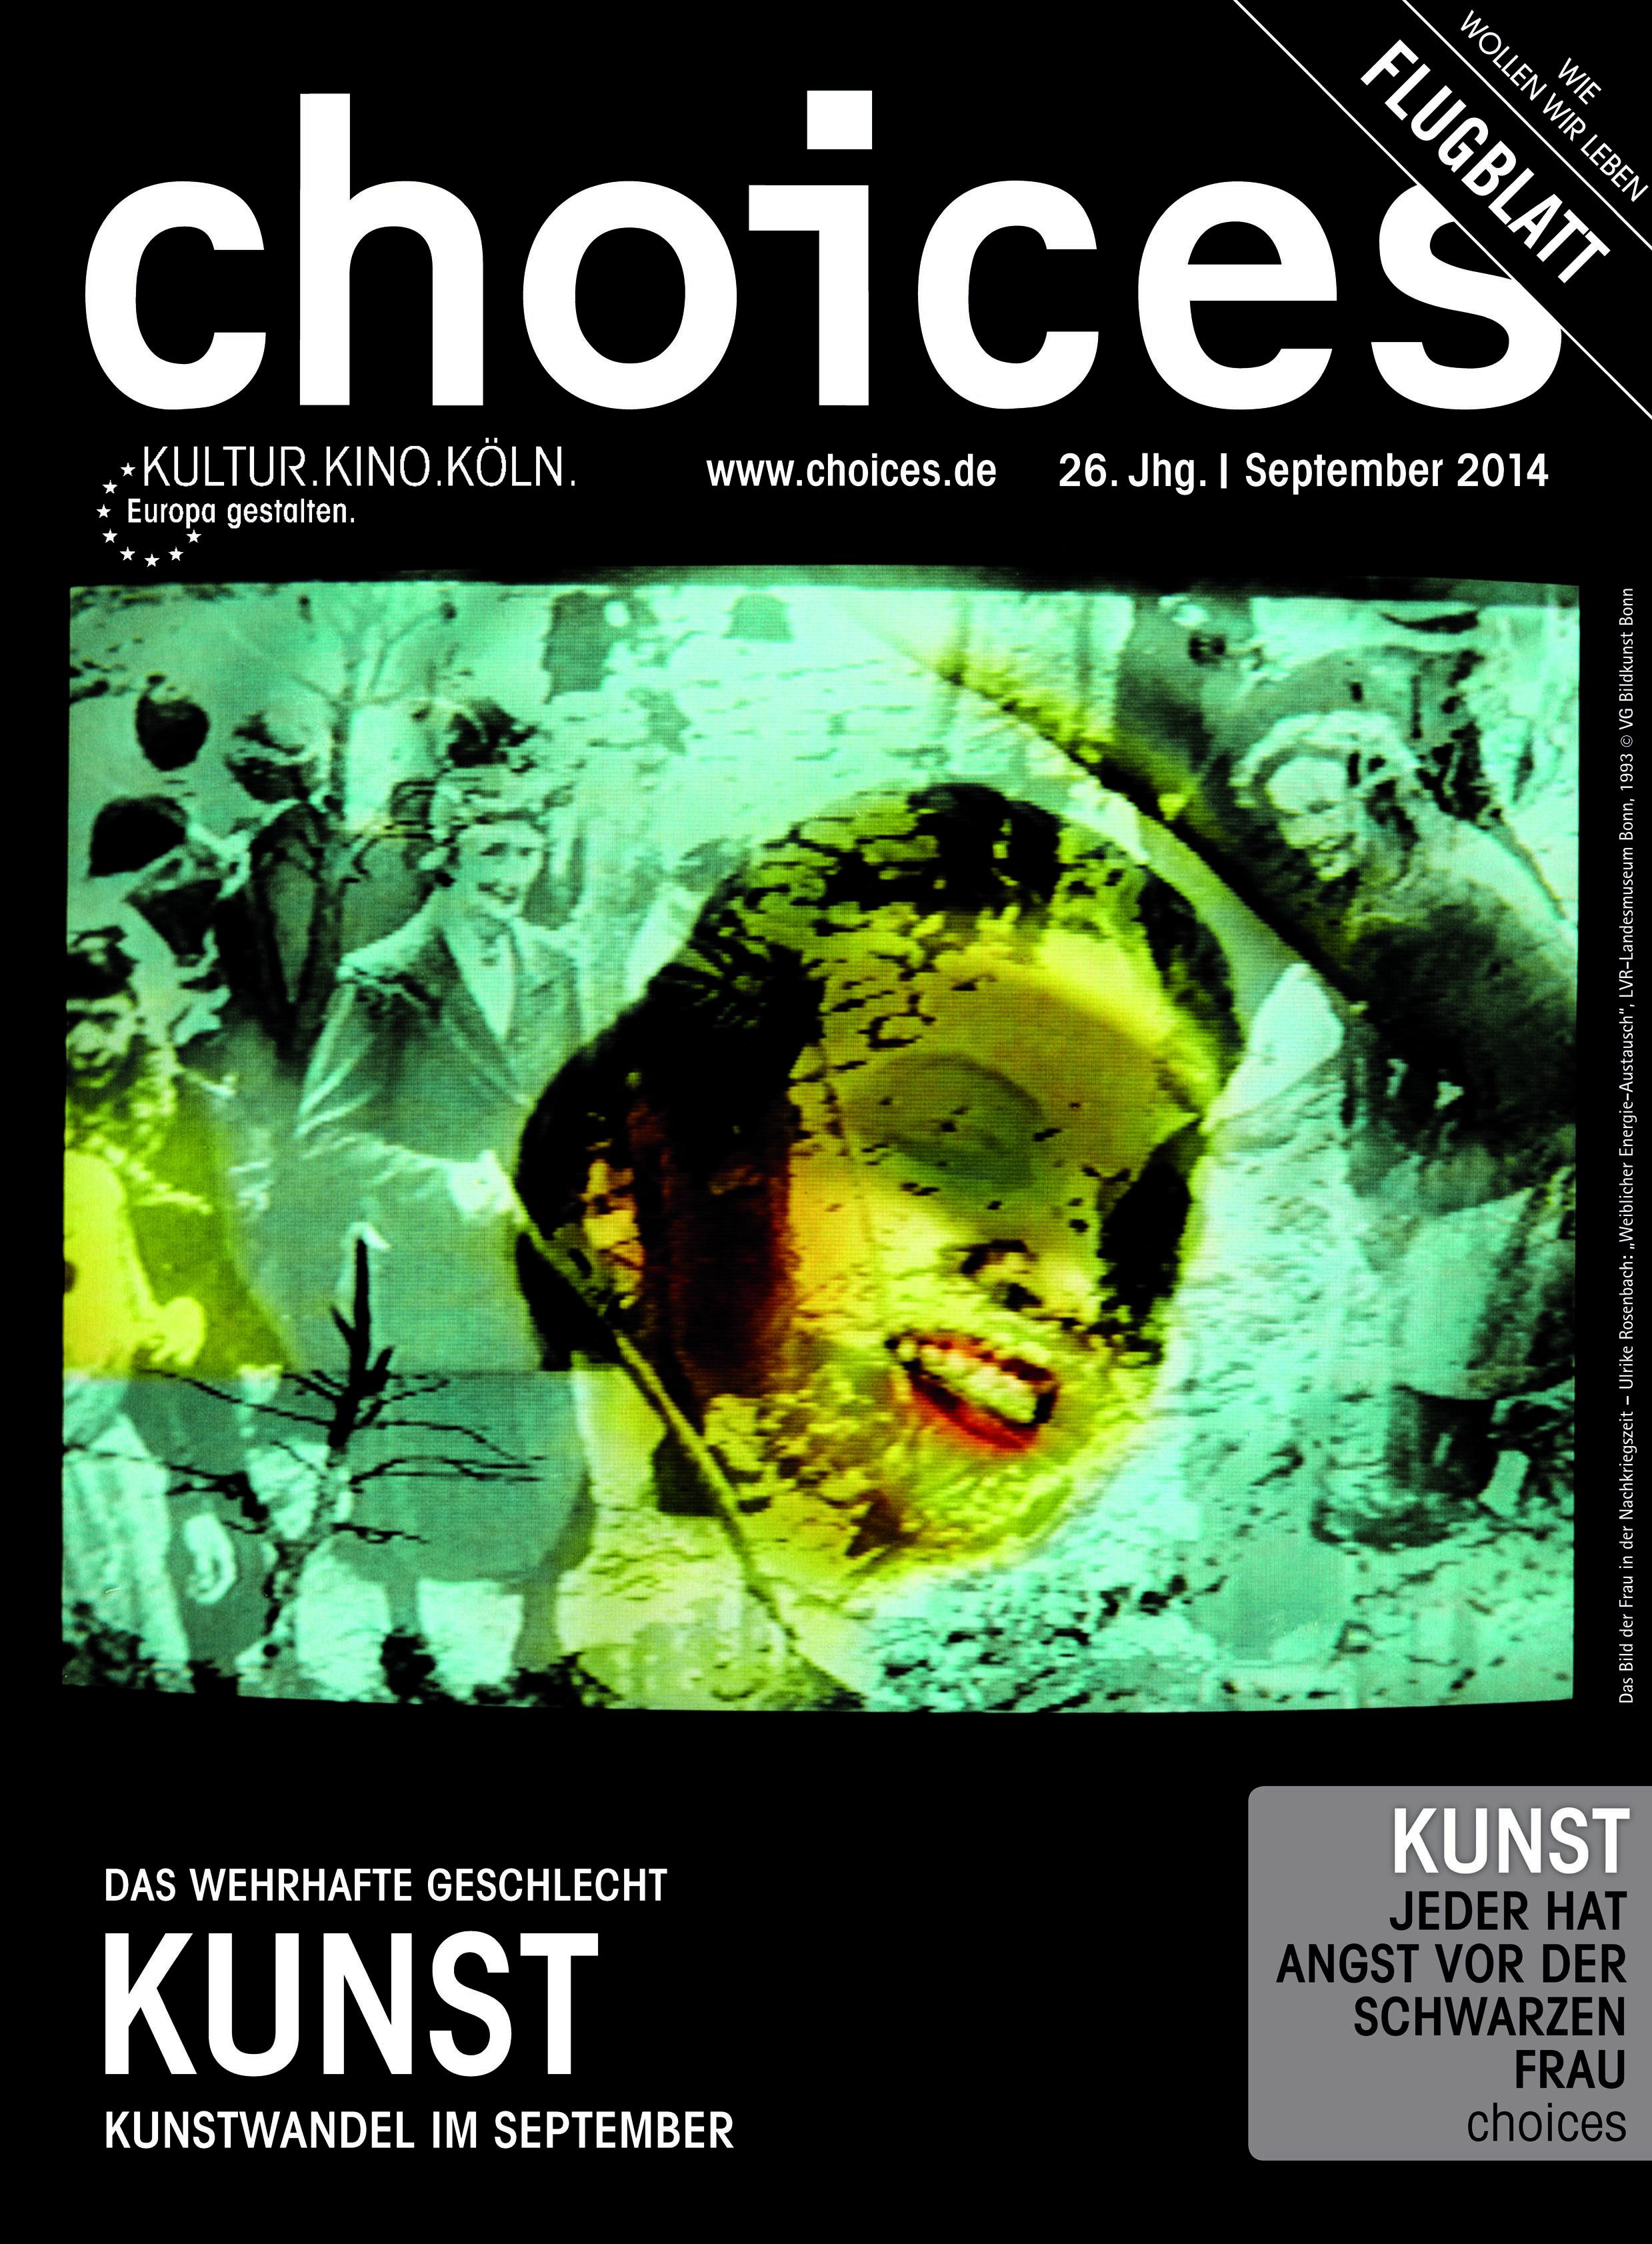 Choices Kino